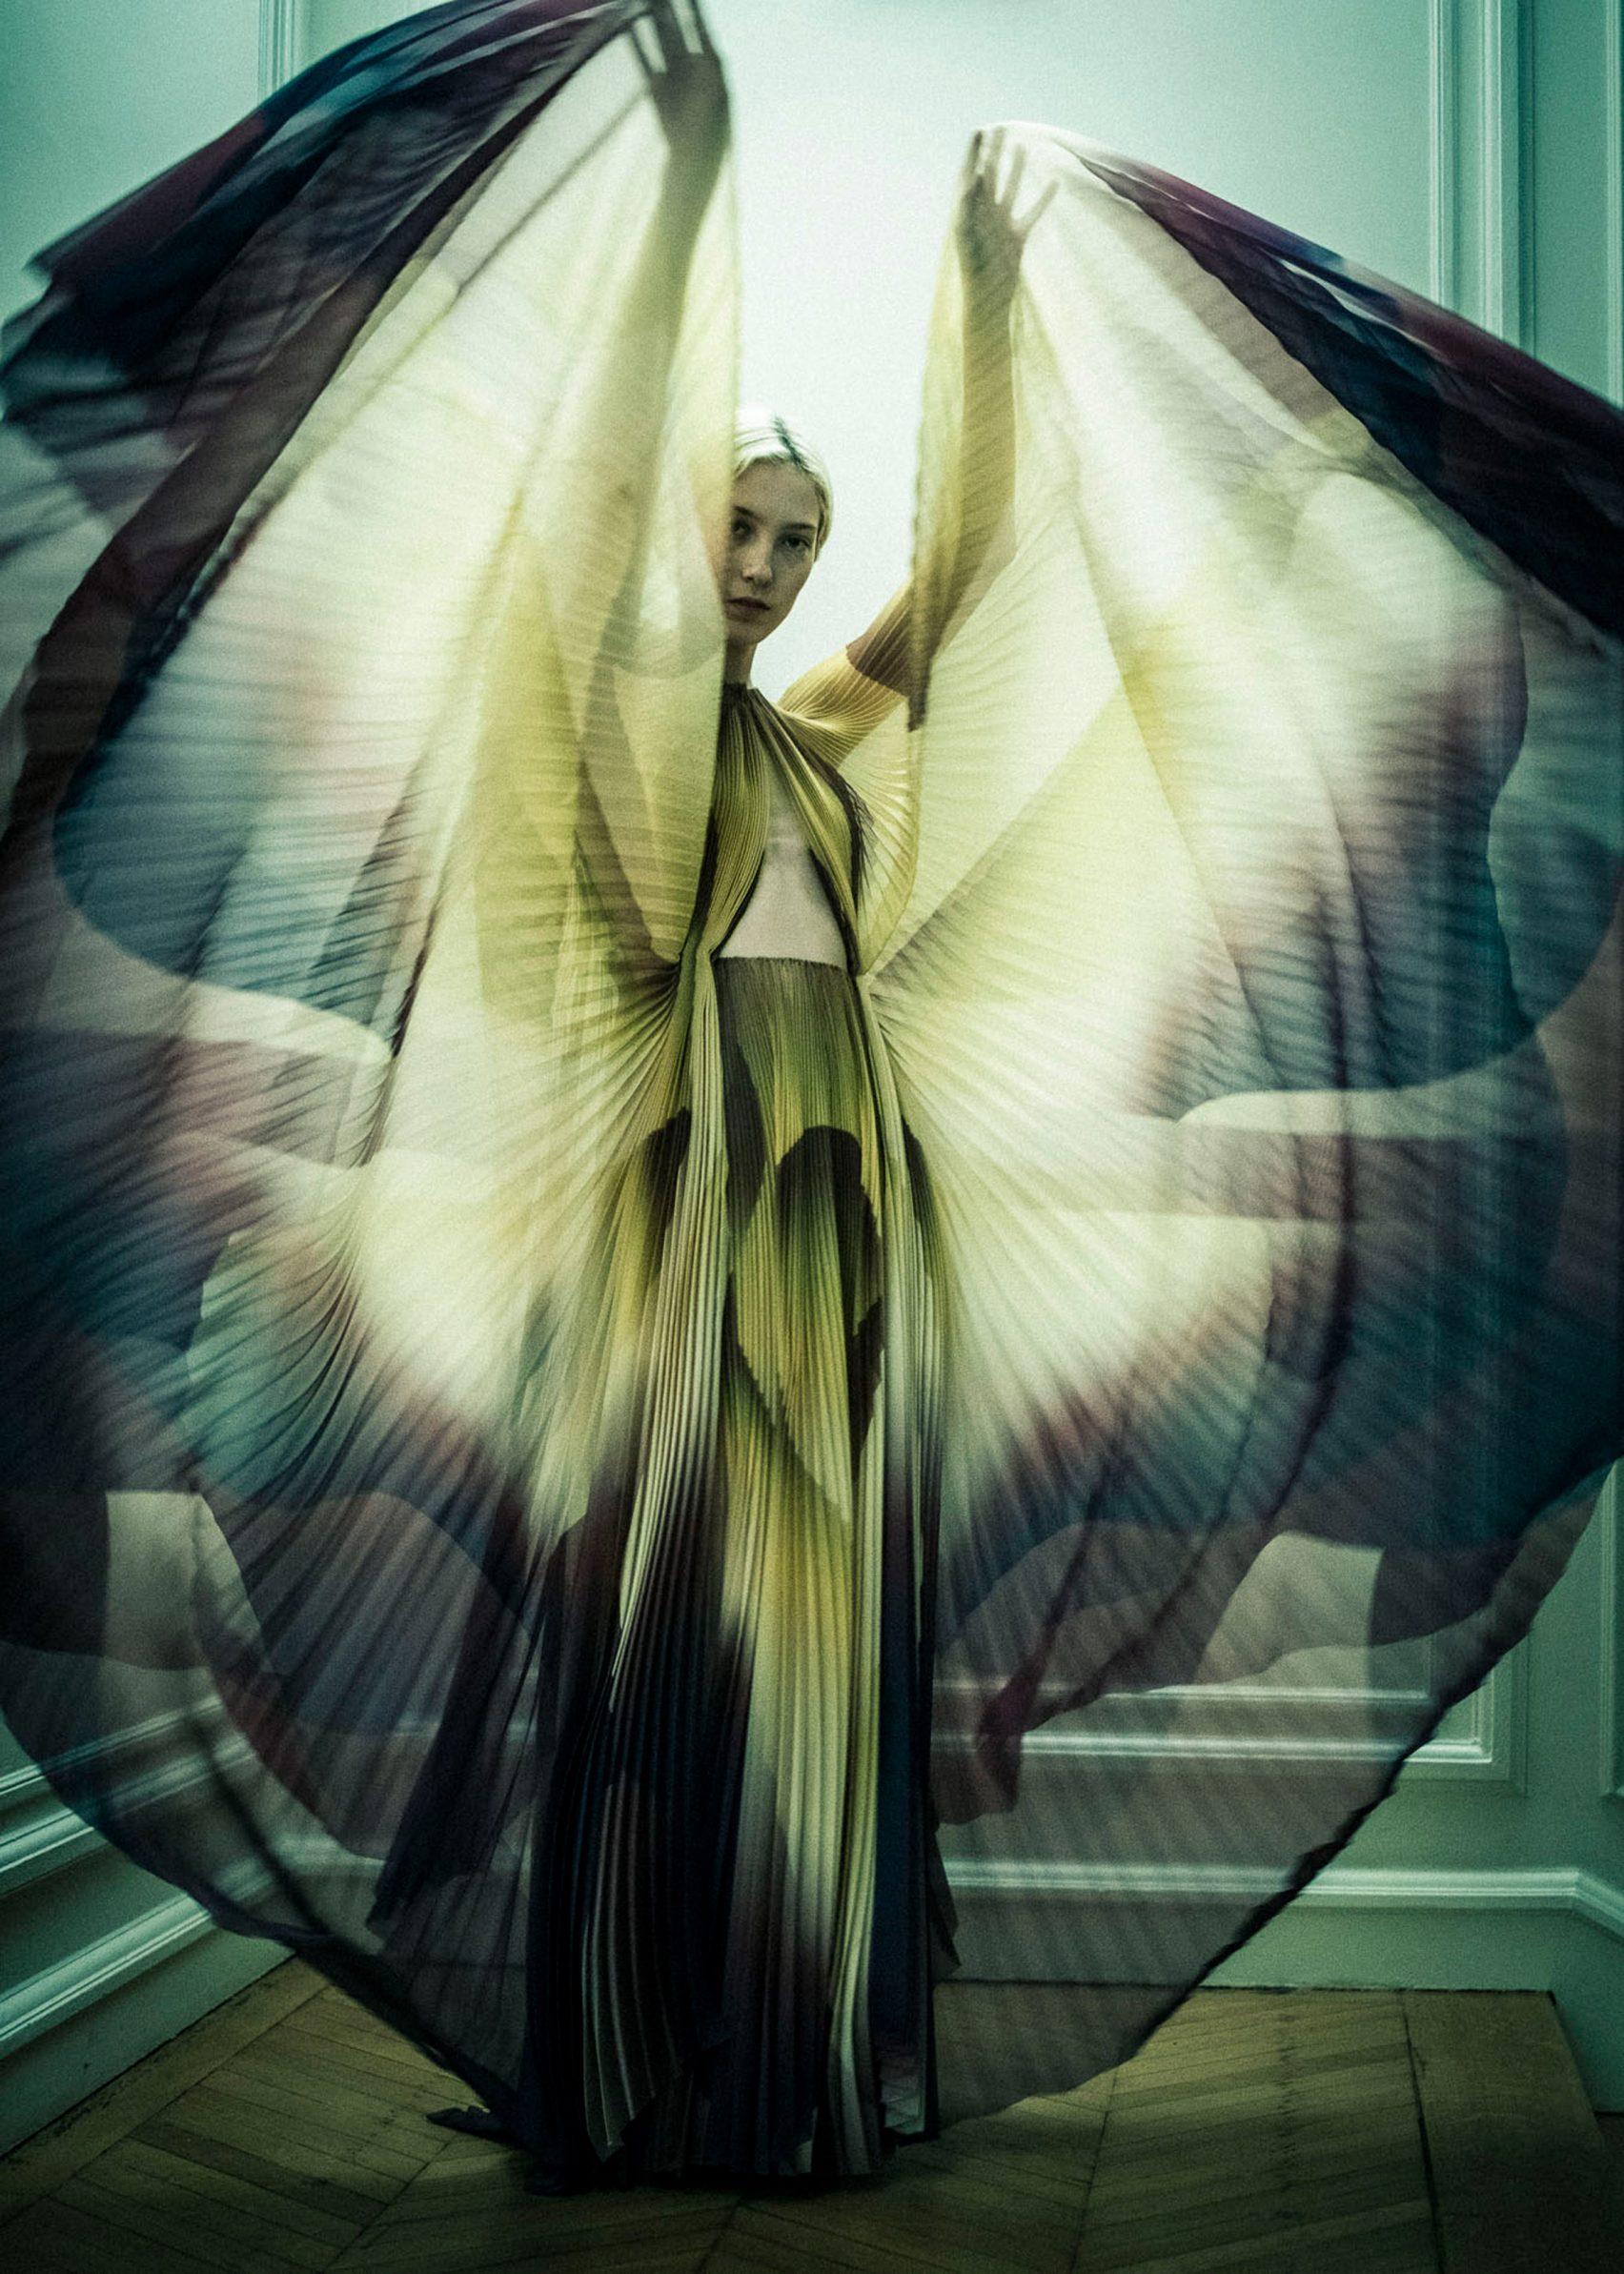 iris-van-herpen-couture-fashion-design_dezeen_2364_col_53-1704x2386.jpg